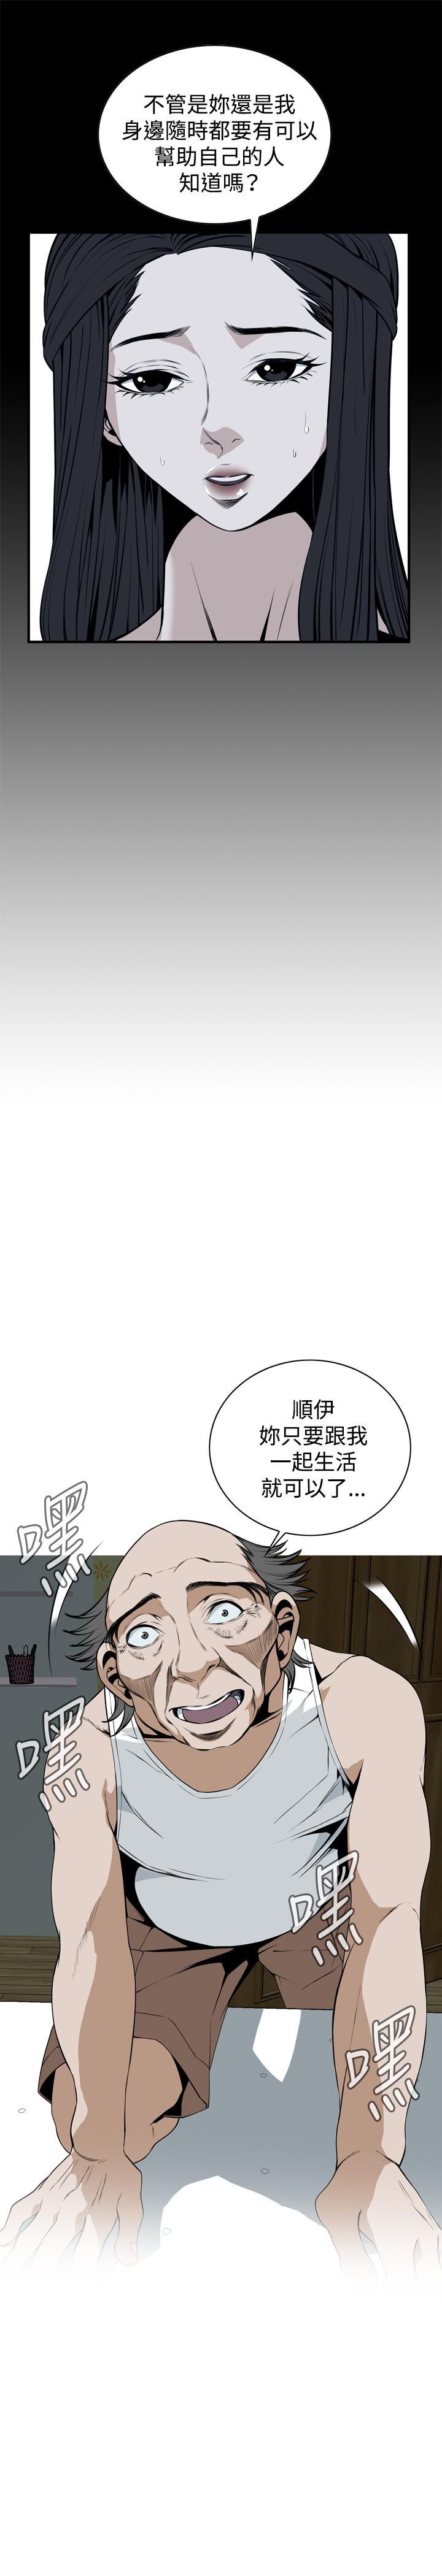 Take a Peek 偷窥 Ch.39~60 [Chinese]中文 7